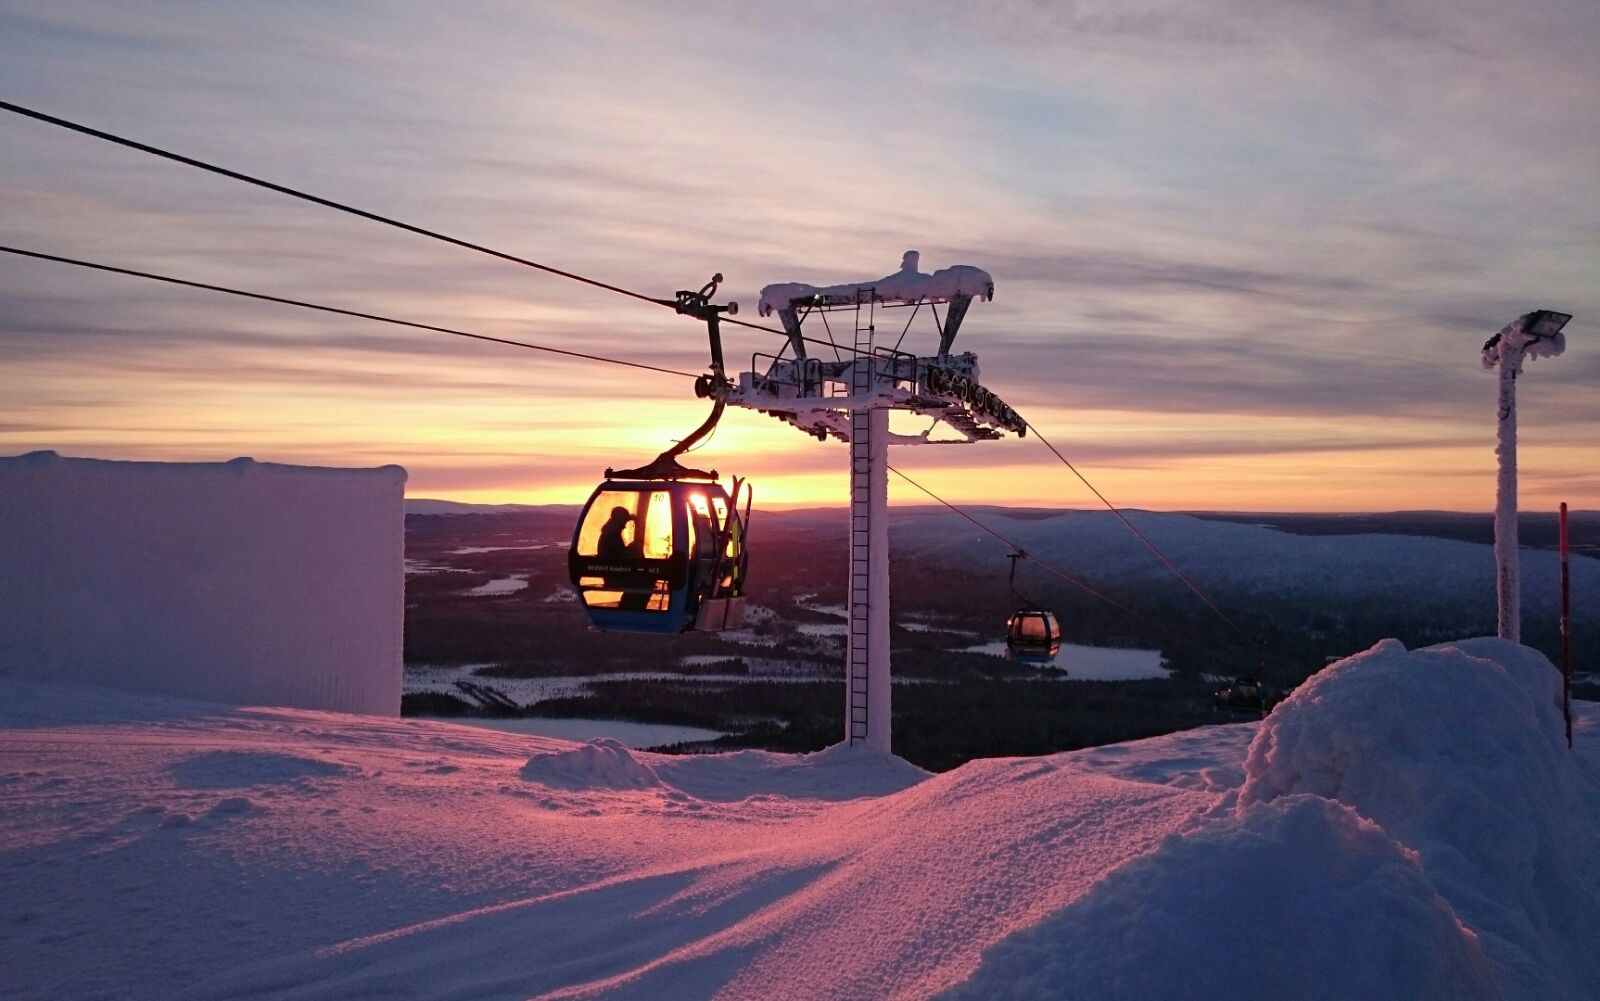 Levi_Ski_Resort_Lapland_midwinter